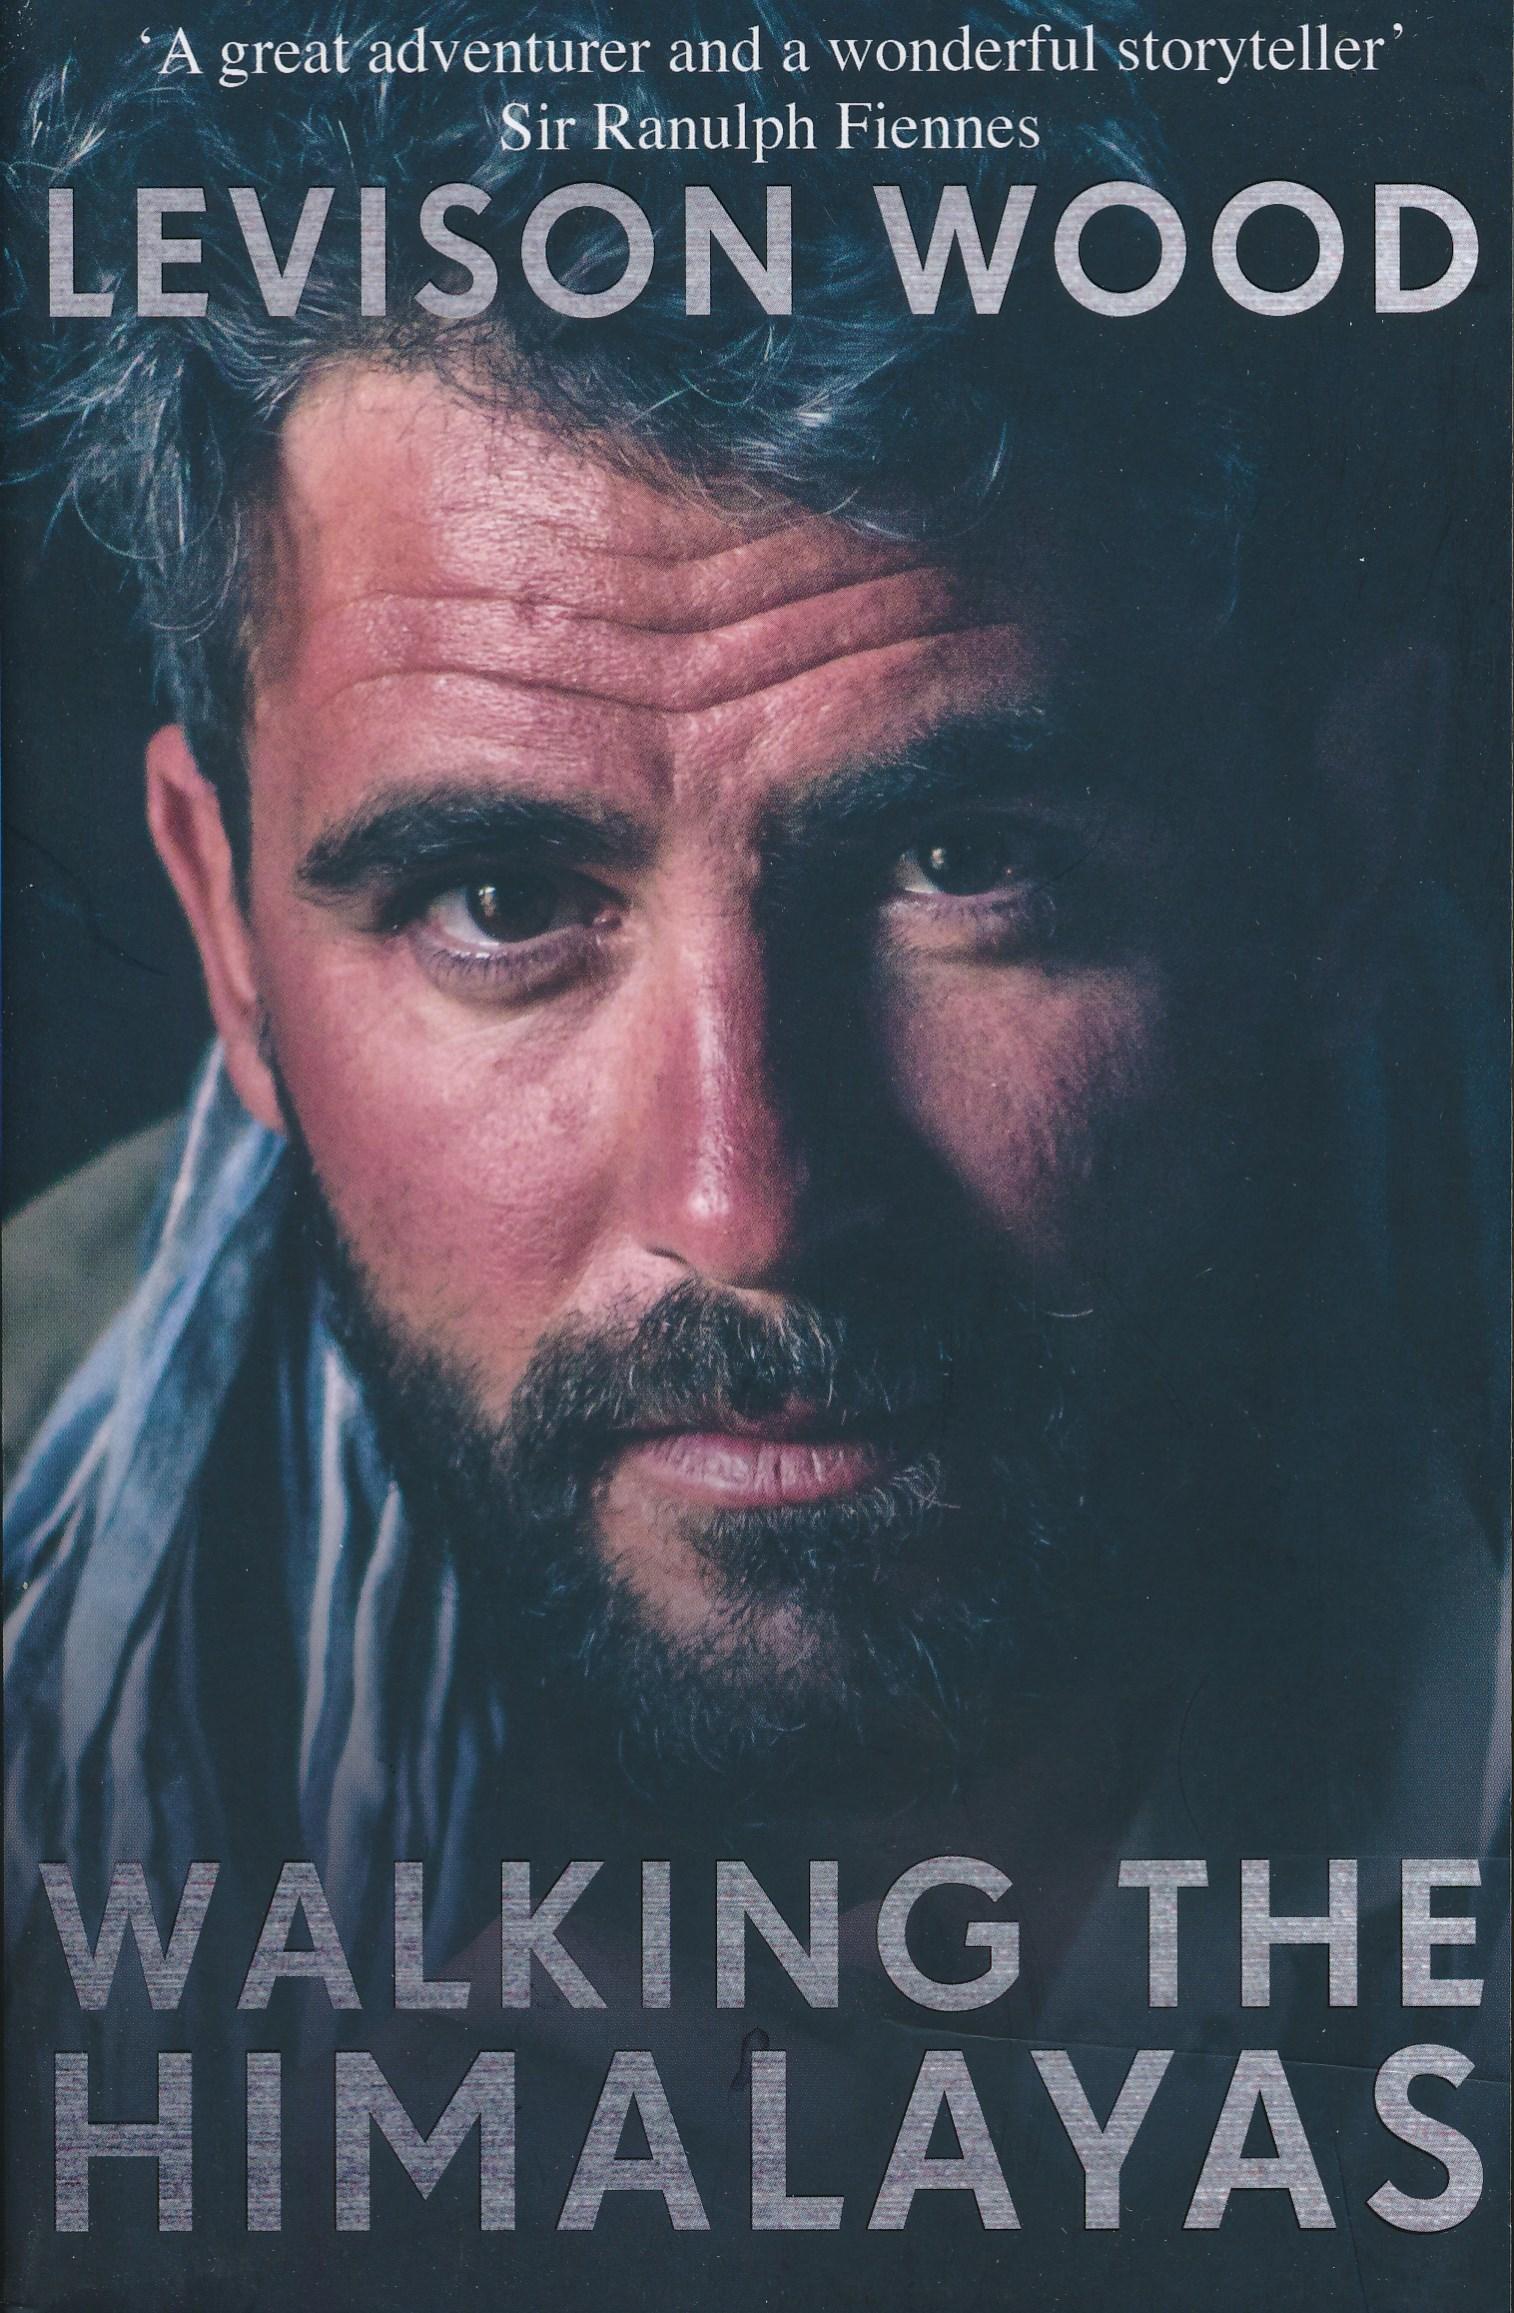 Reisverhaal Walking the Himalayas | Levison Wood <br/>€ 15.50 <br/> <a href='https://www.dezwerver.nl/reisgidsen/?tt=1554_252853_241358_&r=https%3A%2F%2Fwww.dezwerver.nl%2Fr%2Fazie%2Fnepal%2Fhimalaya%2Fc%2Fboeken%2Freisverhalen%2F9781473626263%2Freisverhaal-walking-the-himalayas-levison-wood%2F' target='_blank'>Meer Info</a>